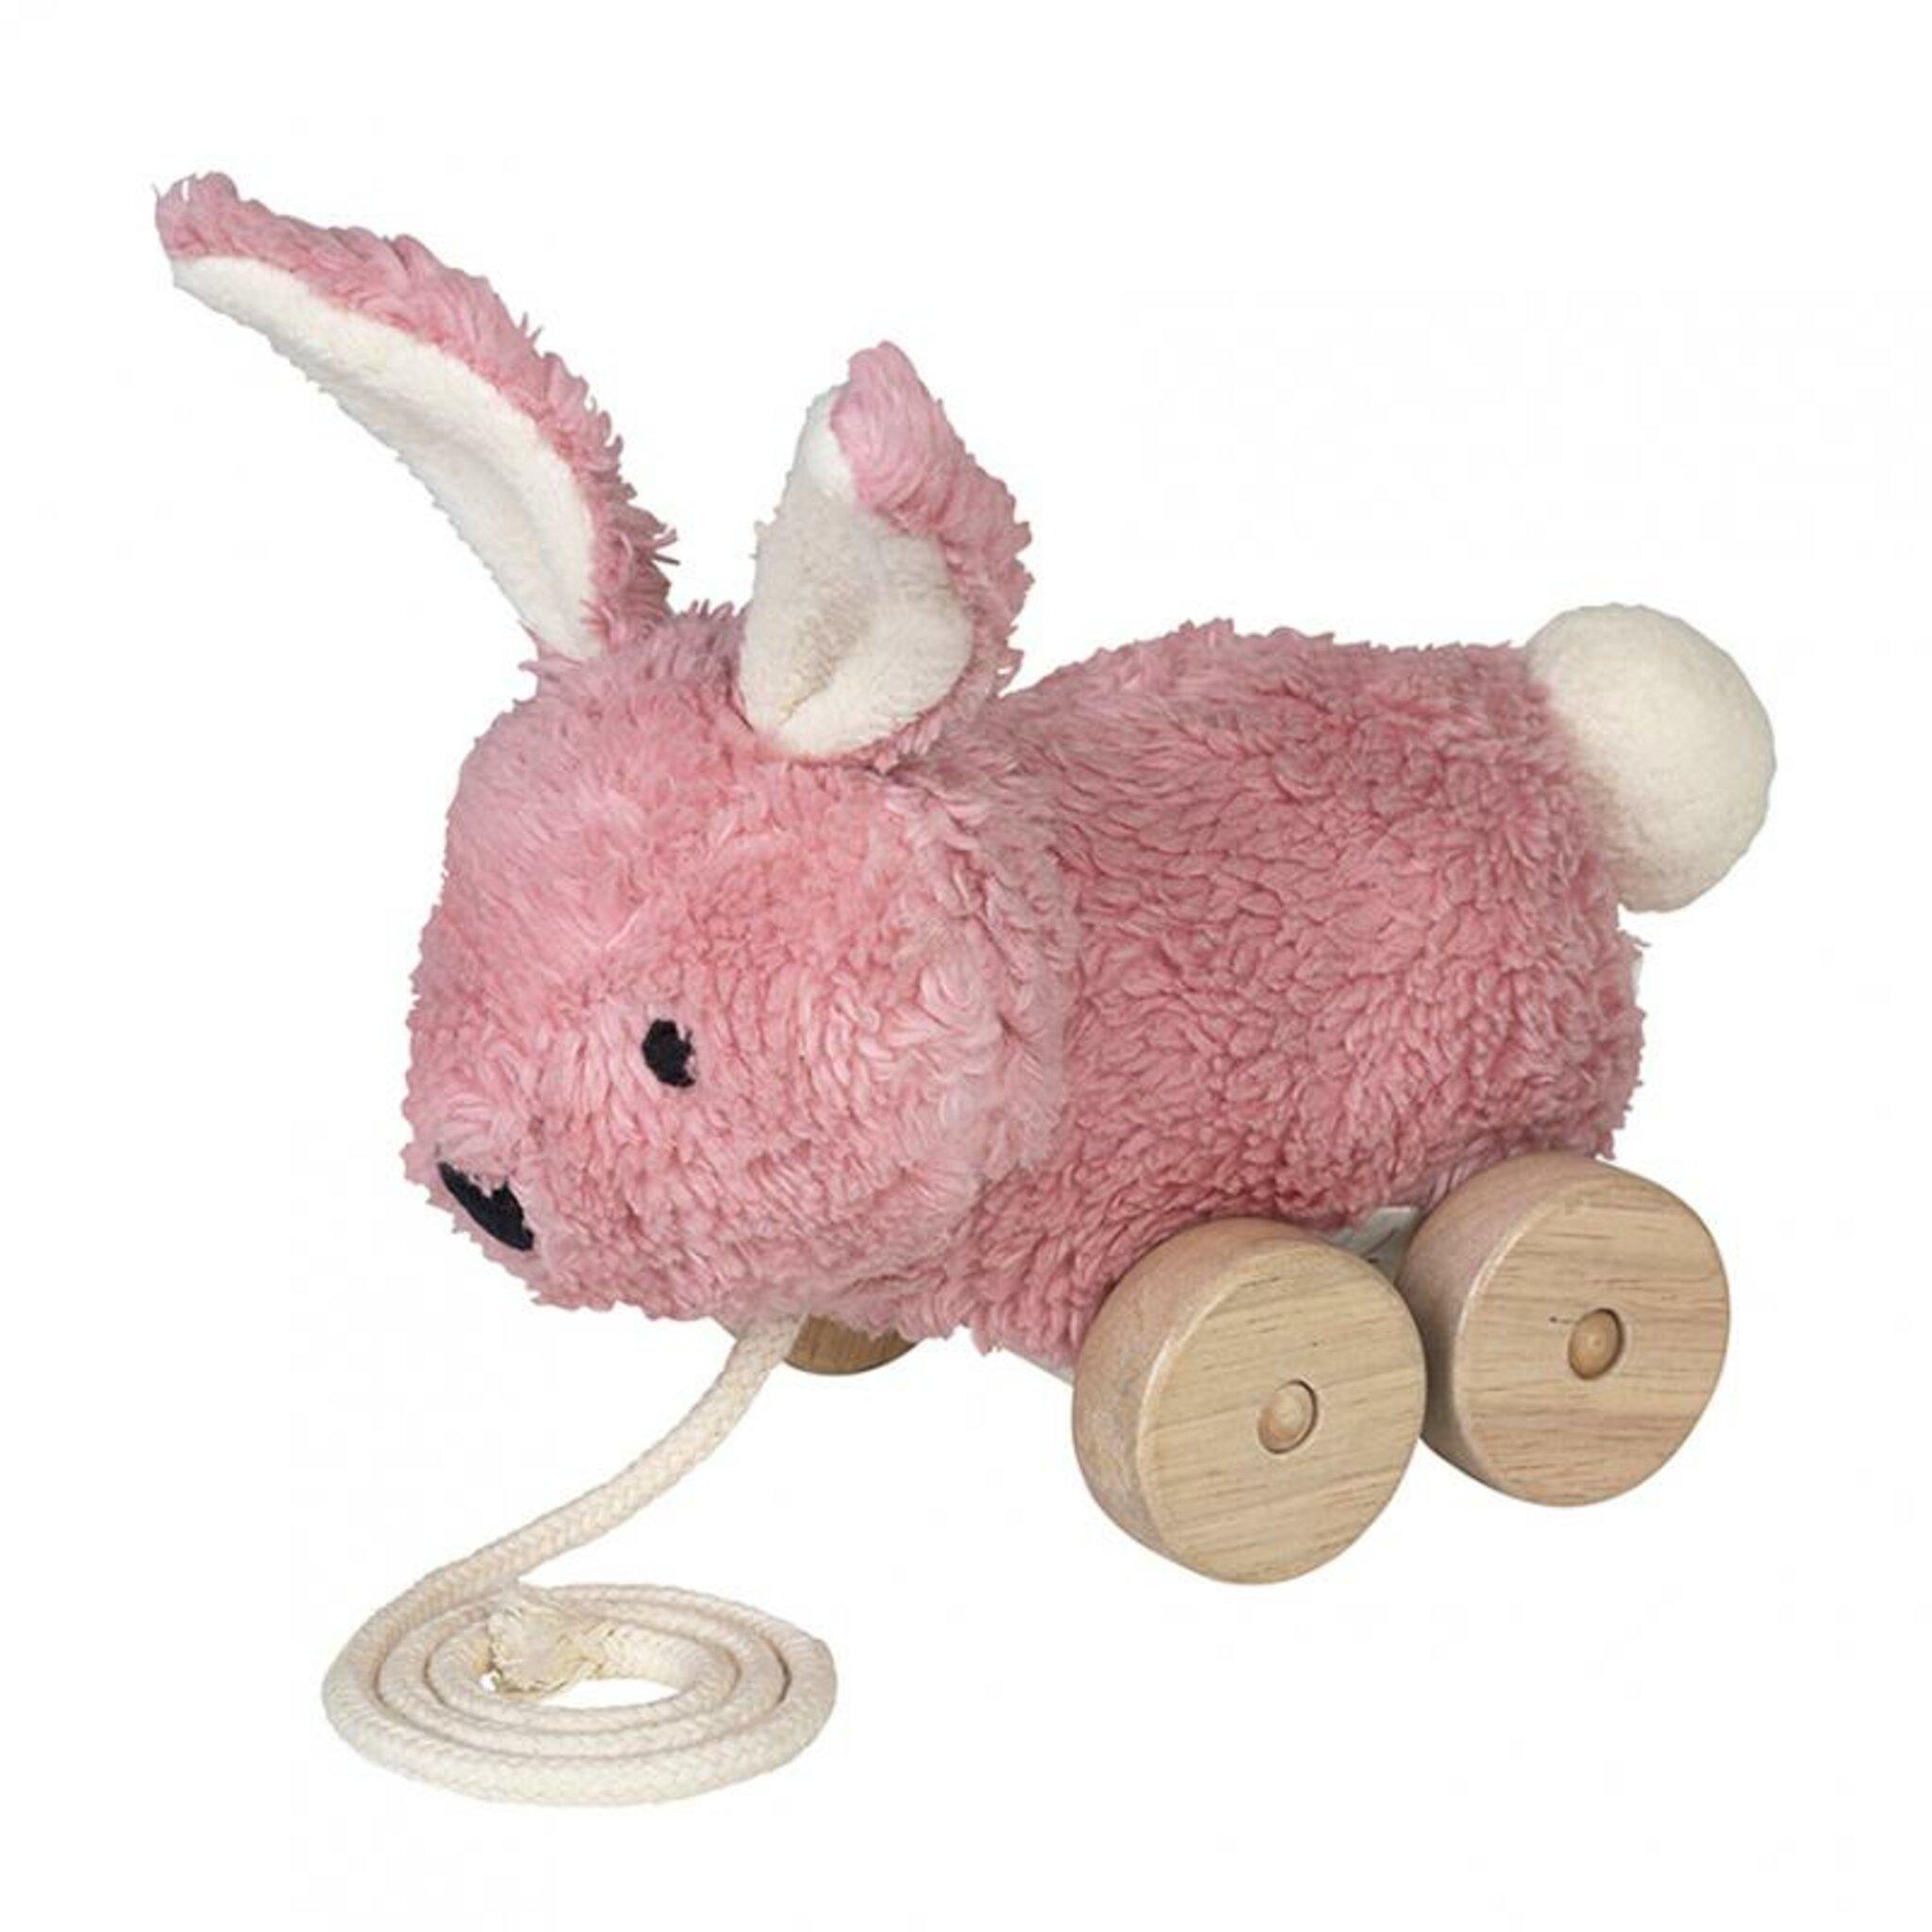 Mingus Rabbit Pull Toy